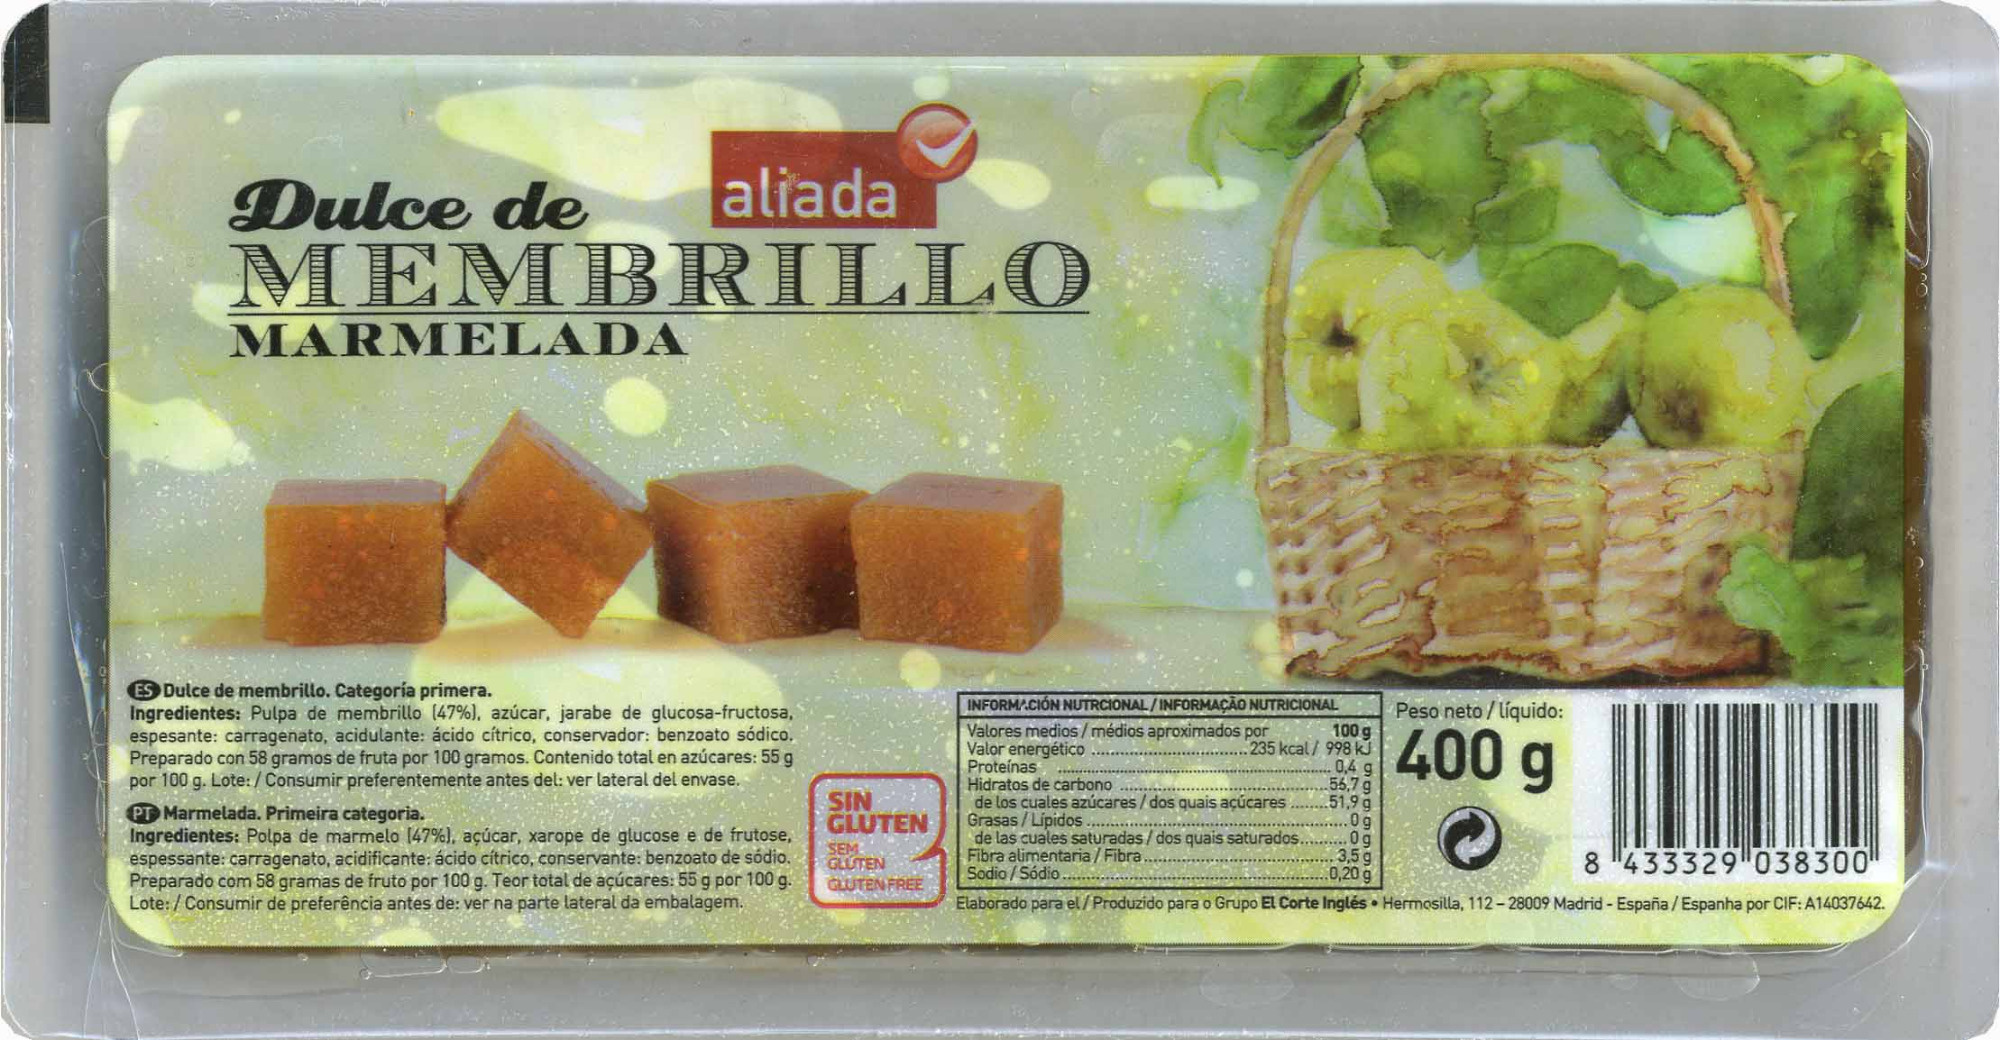 Dulce de membrillo tarrina 400 g - Produit - es